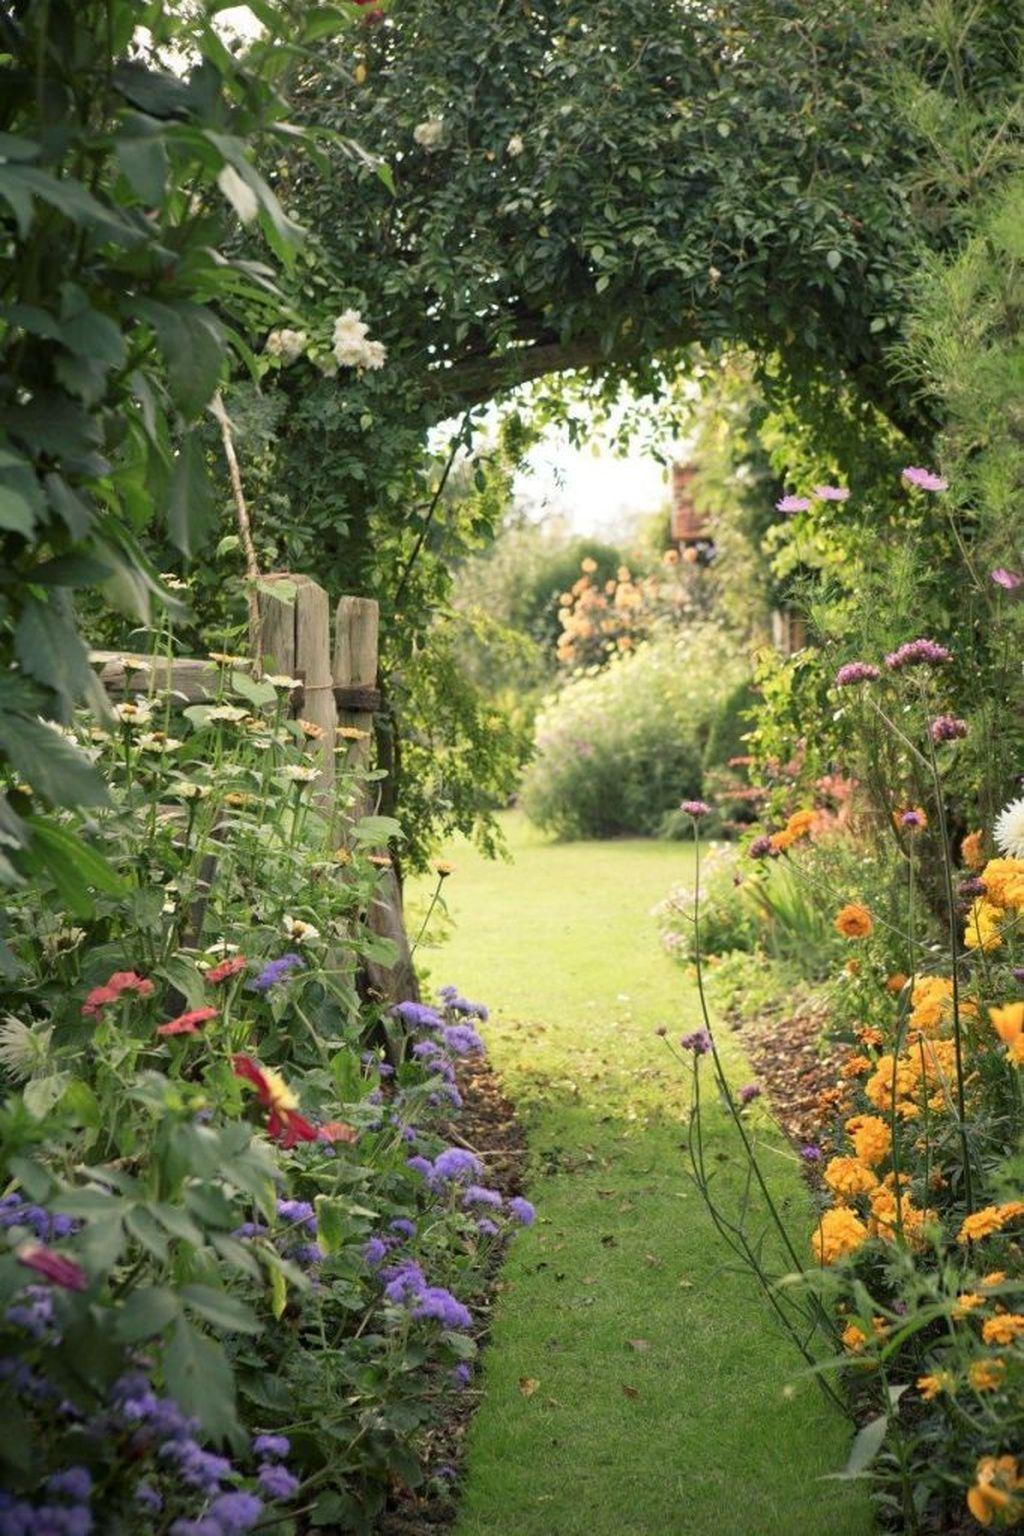 The Best Urban Garden Design Ideas For Your Backyard 29